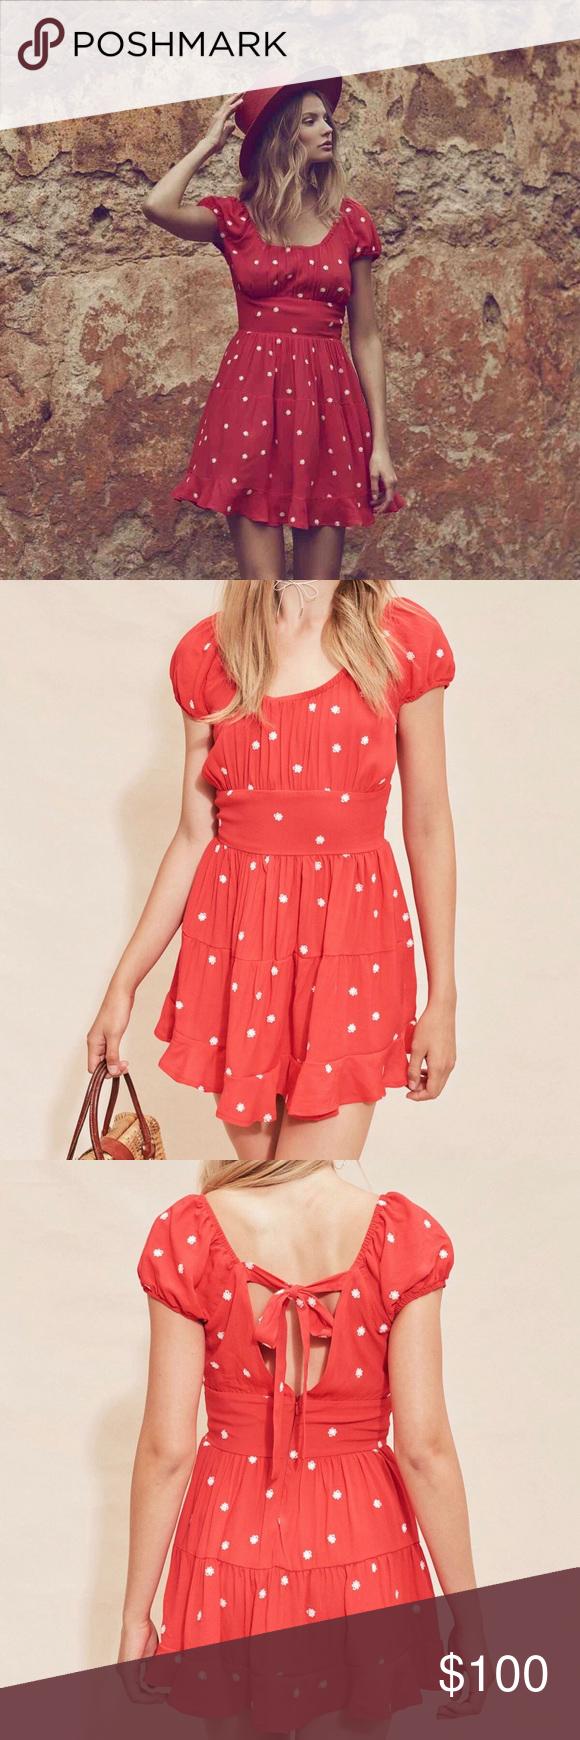 For Love And Lemons Chiquita Tiered Mini Dress Dresses Clothes Design New Dress [ 1740 x 580 Pixel ]